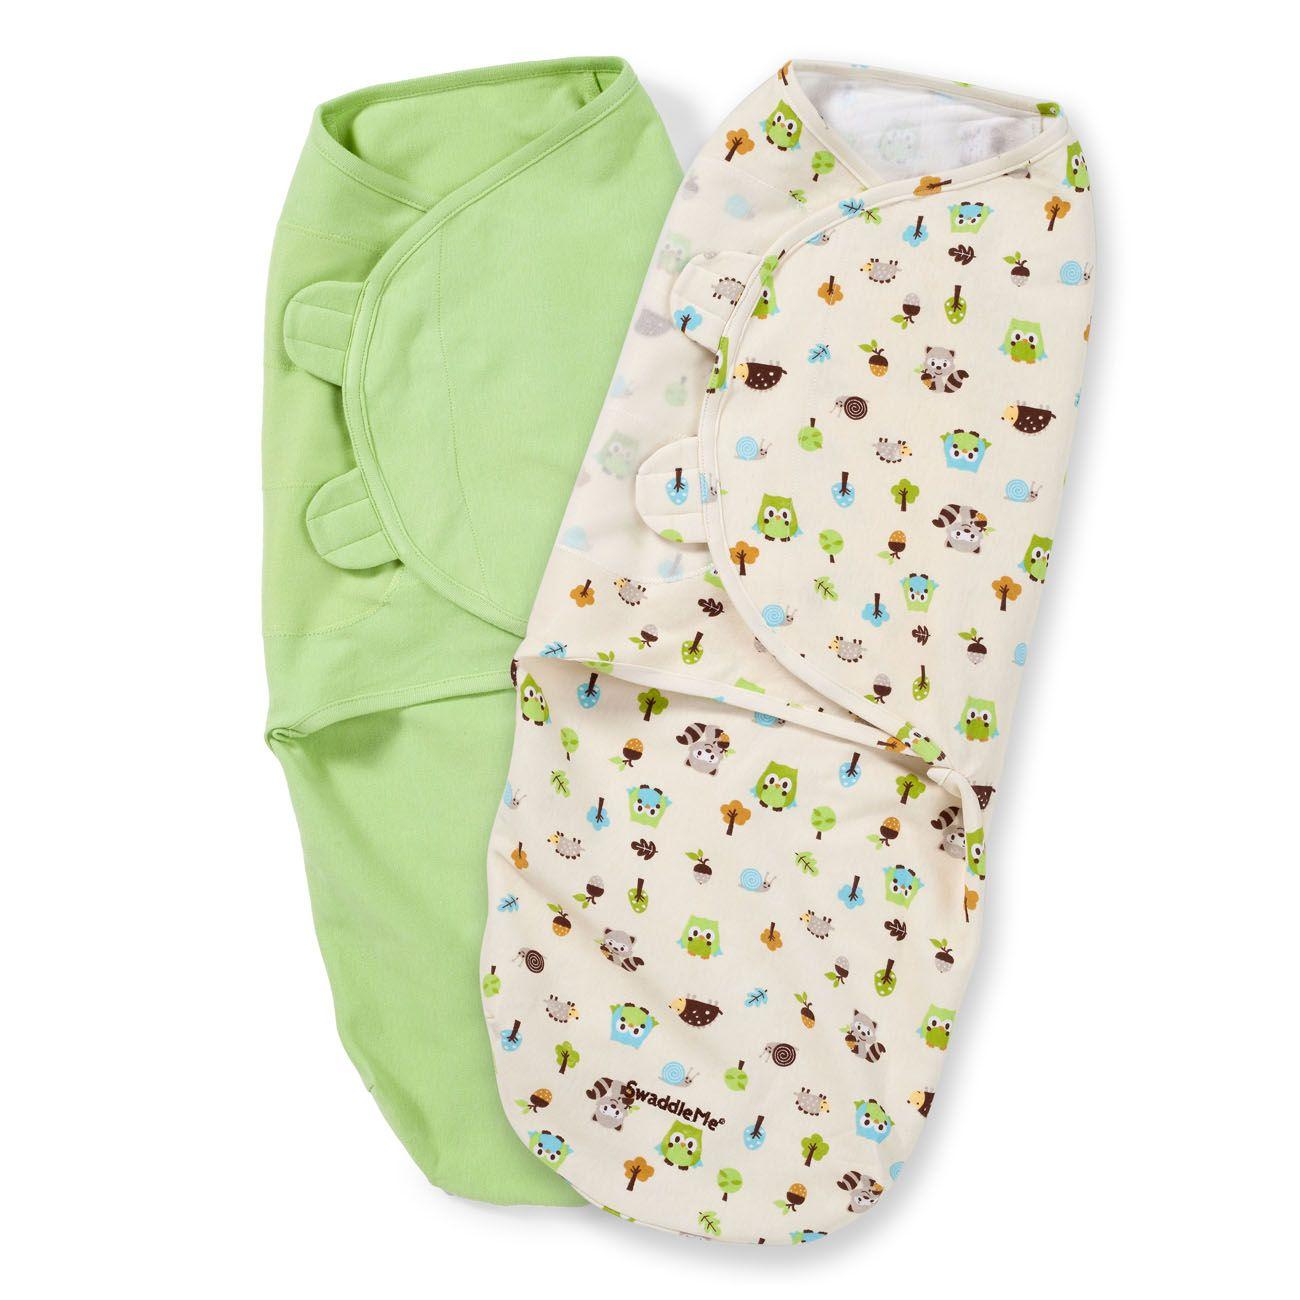 Walmart Swaddle Blankets Extraordinary Swaddleme® Adjustable Infant Wrap2 Pack Baby Apparel  Walmart Design Inspiration